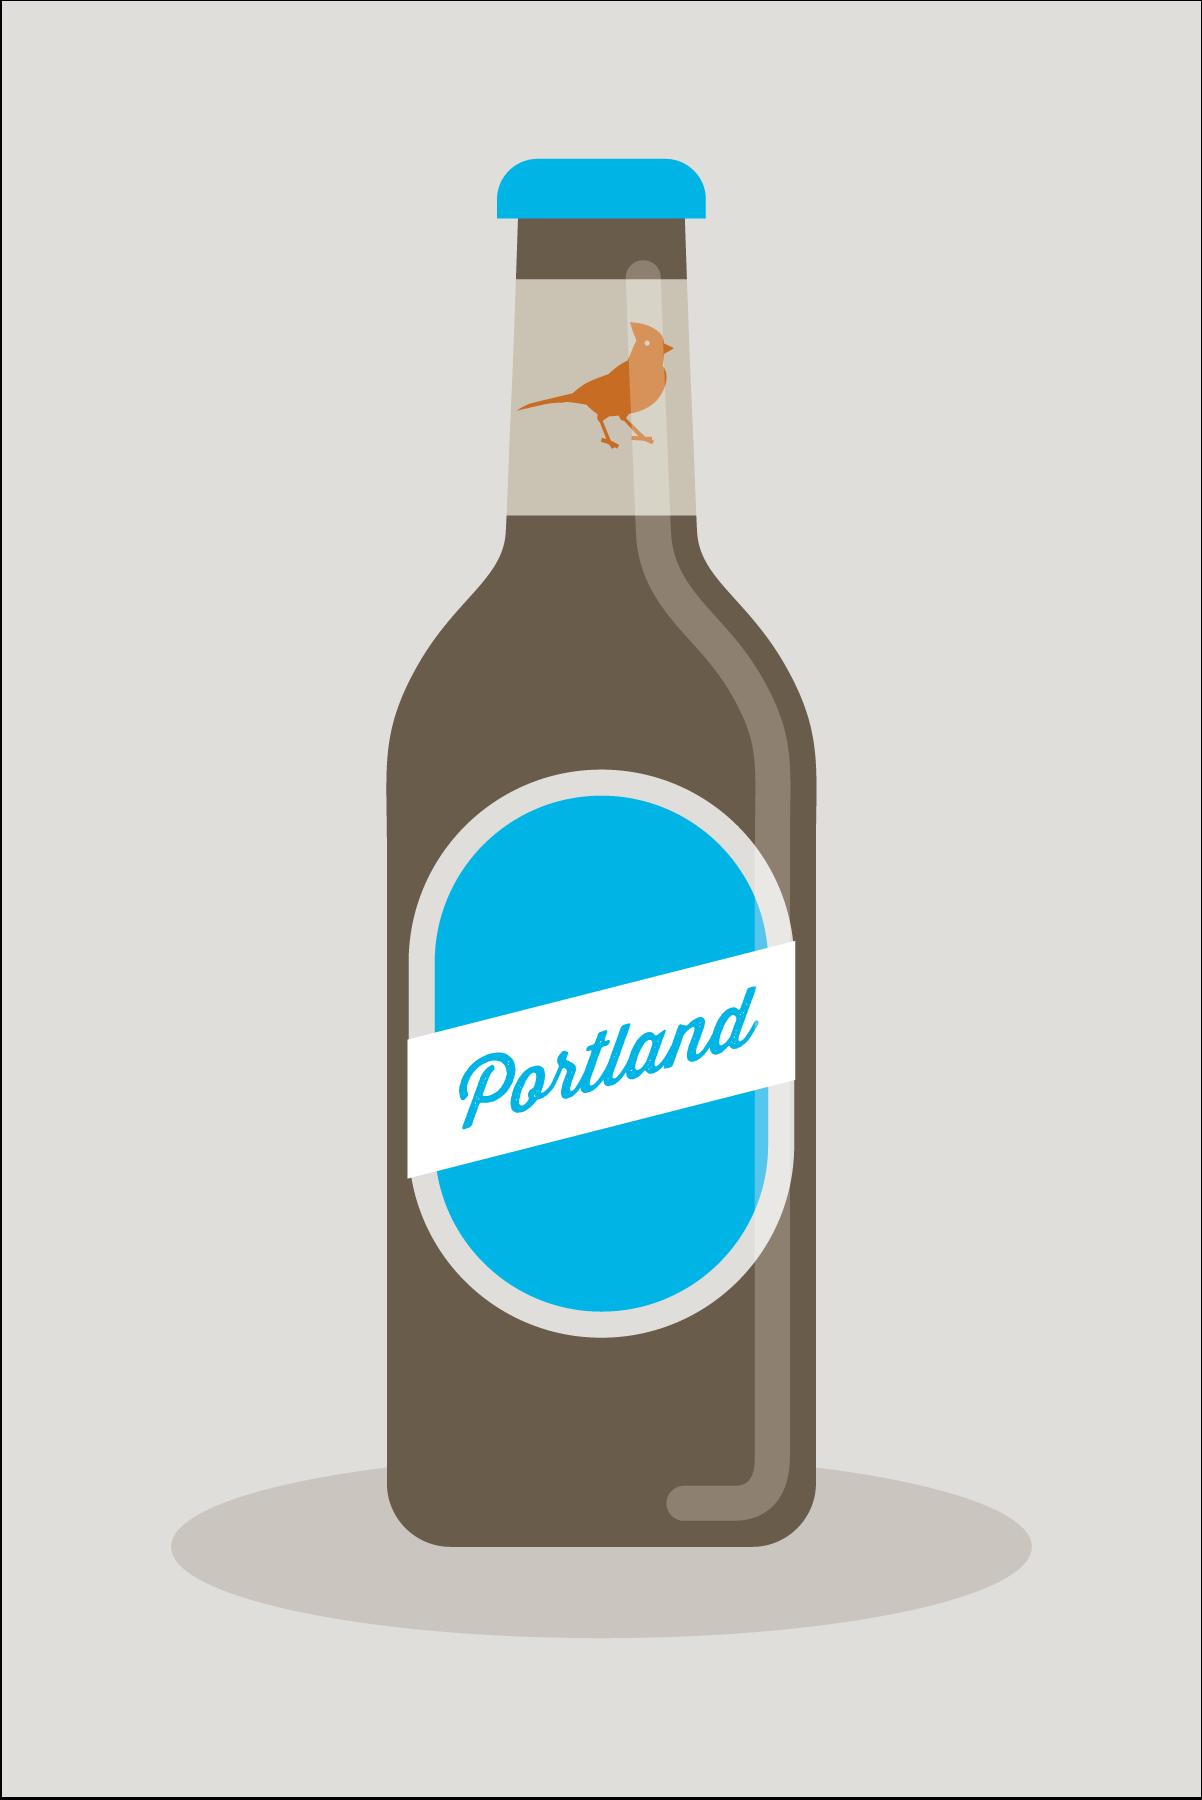 Portland beer illustration by Mark Mularz of Fetch Design.